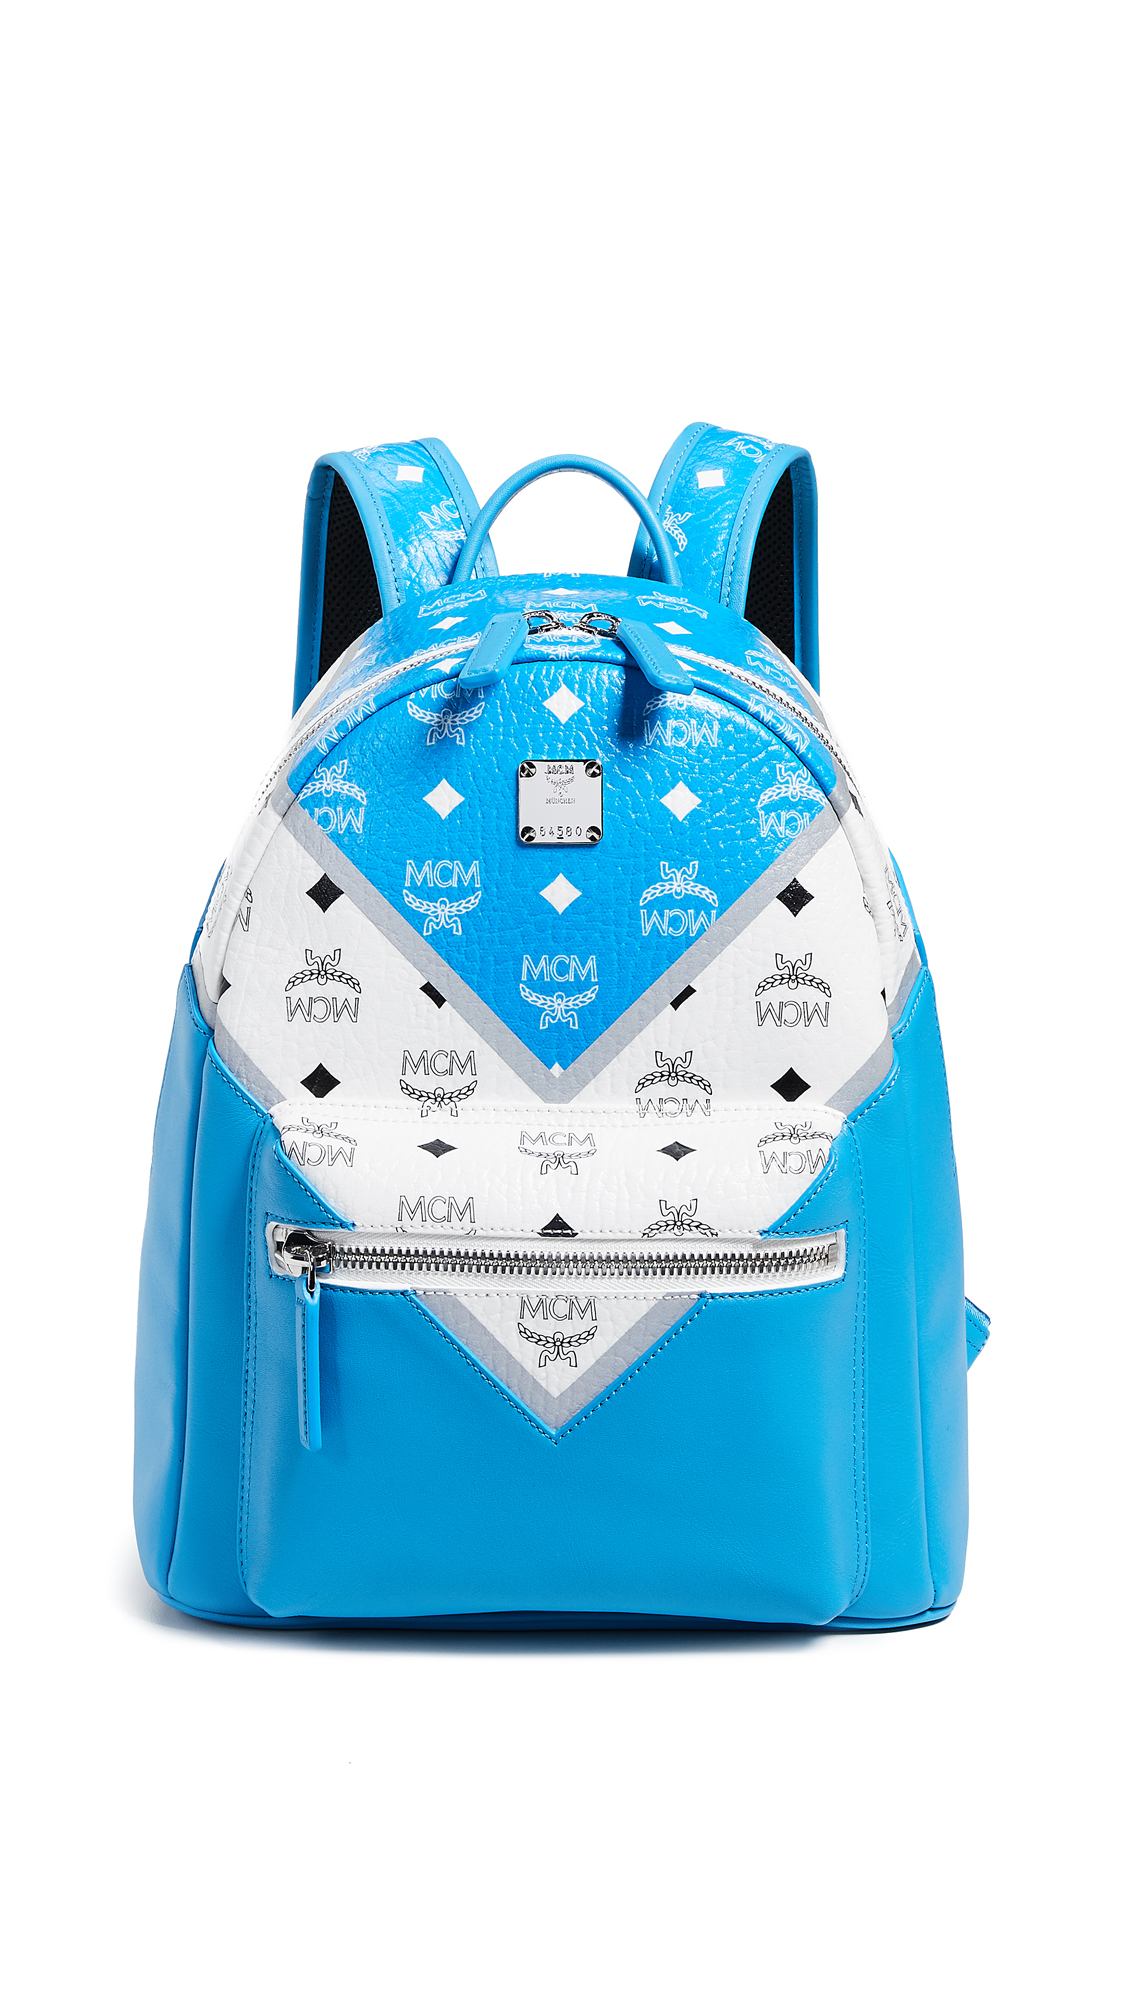 MCM Stark Medium Move Color-Block Backpack in Blue/White